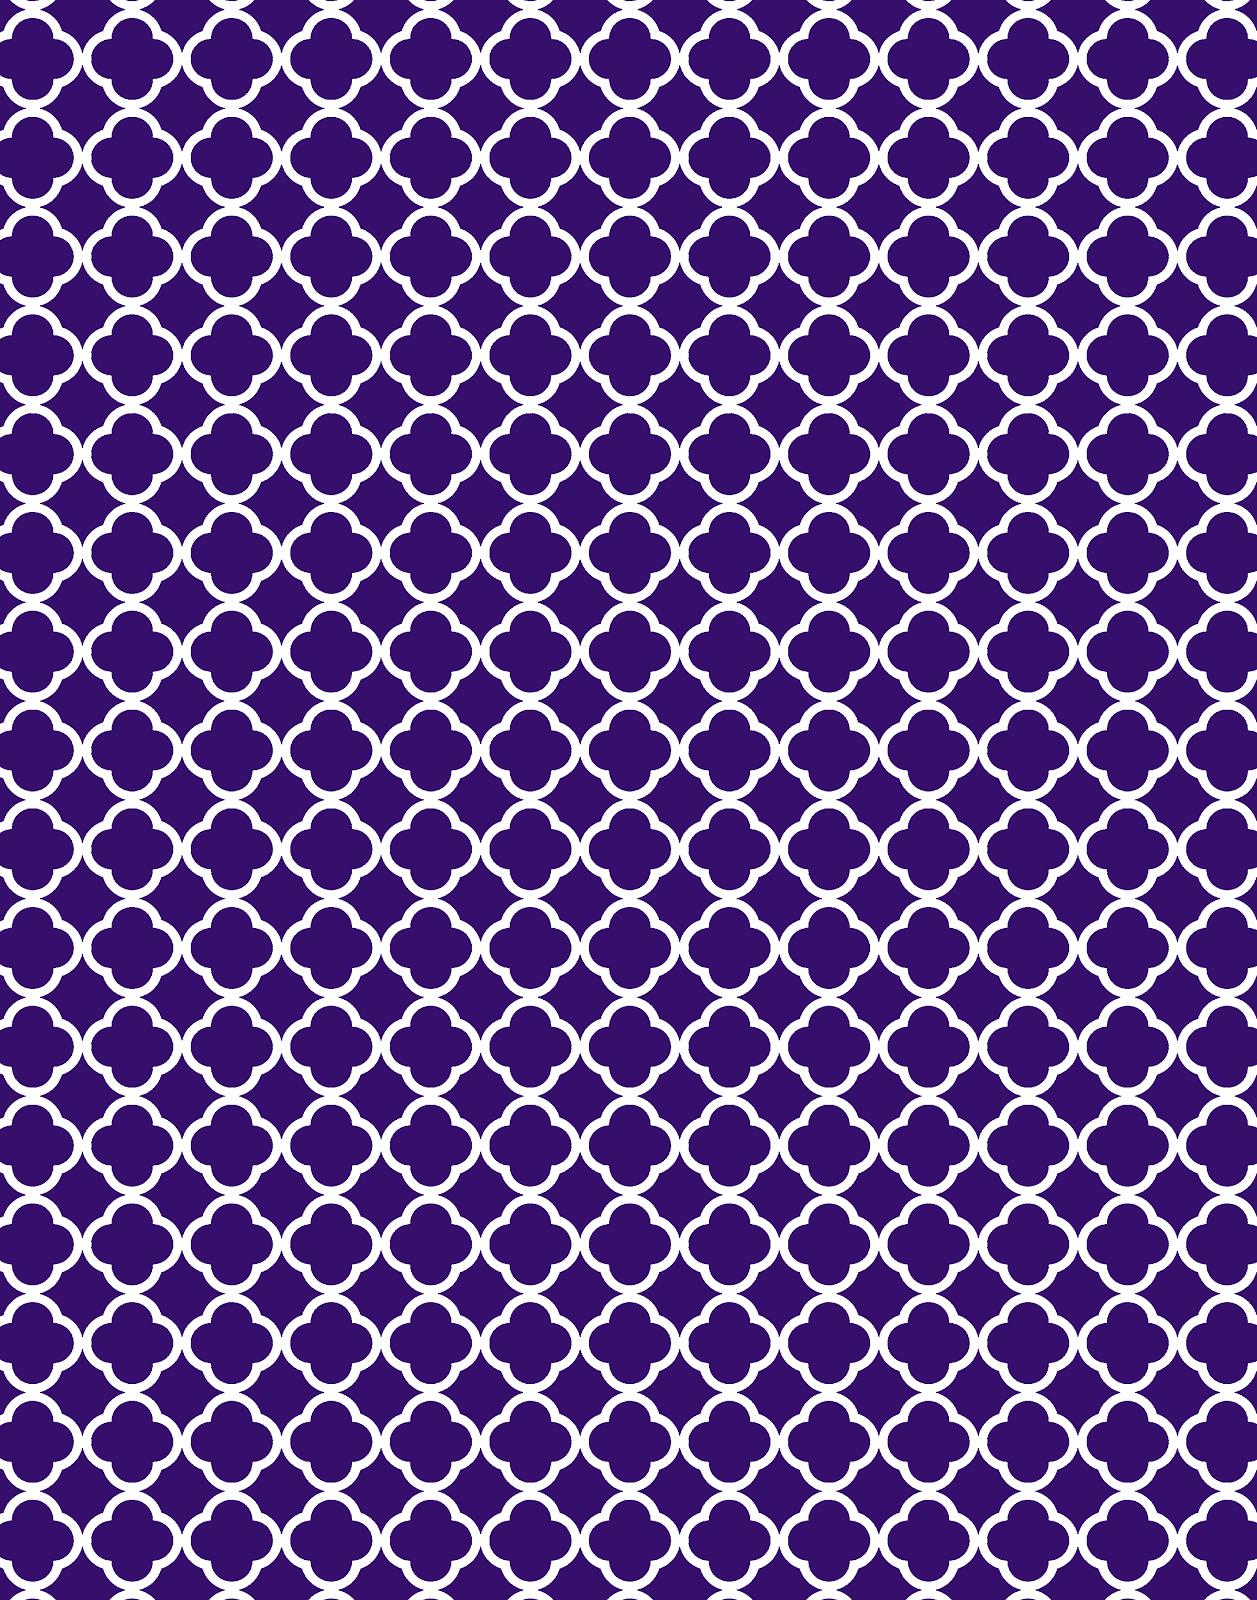 quatrefoil pattern background - photo #17